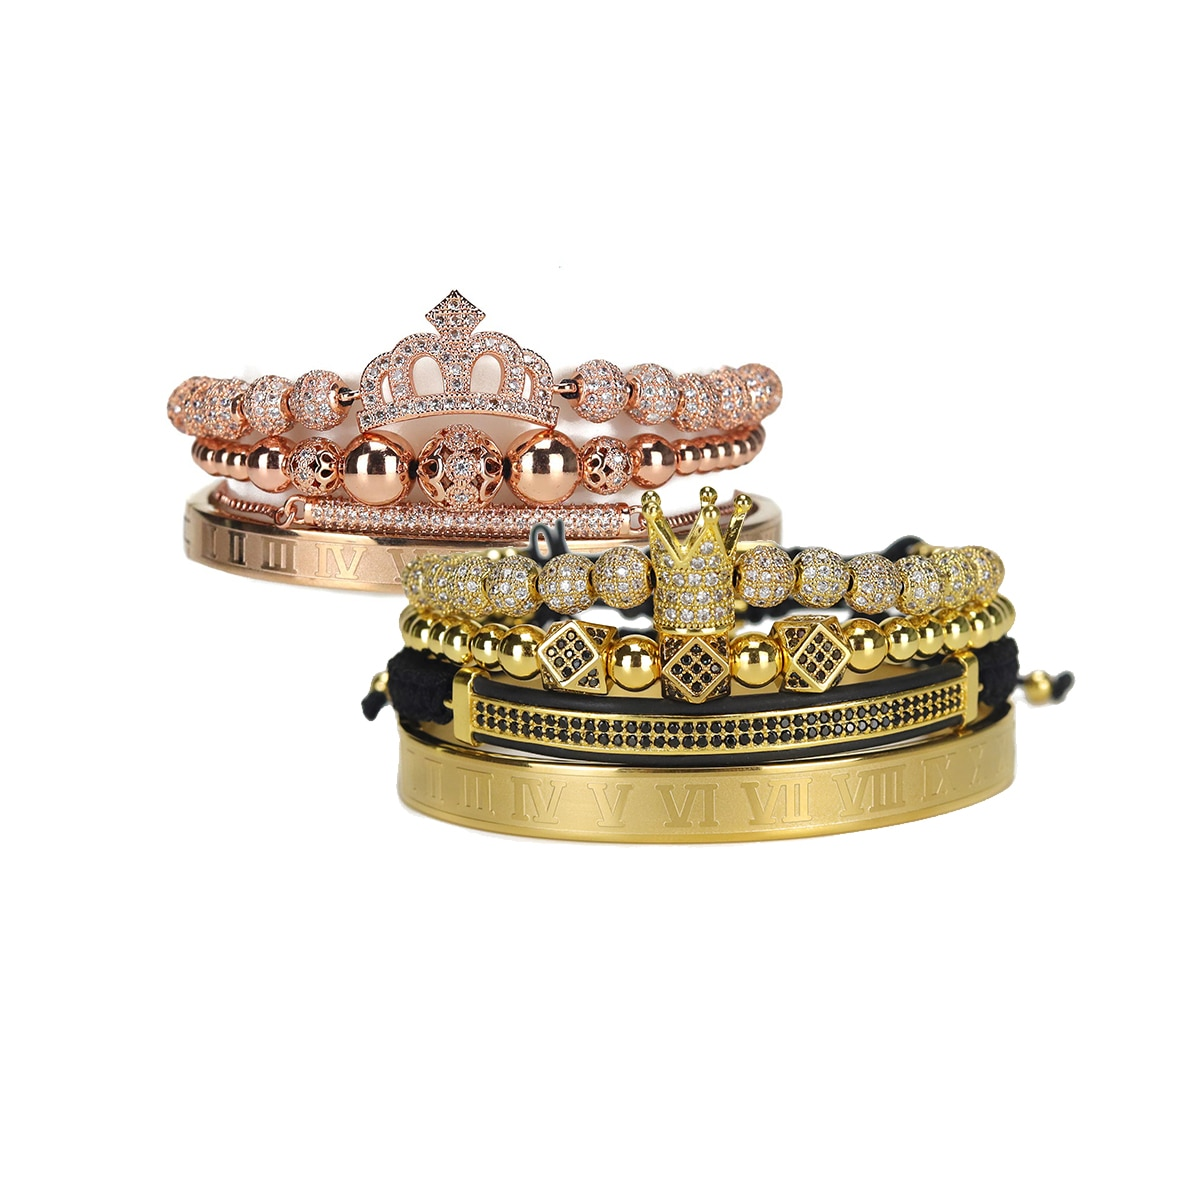 Luxury King Queen Crown Men Women Couple Lover Bracelet Stainless steel bangle CZ beads bracelets bangles for Men Women Jewelry